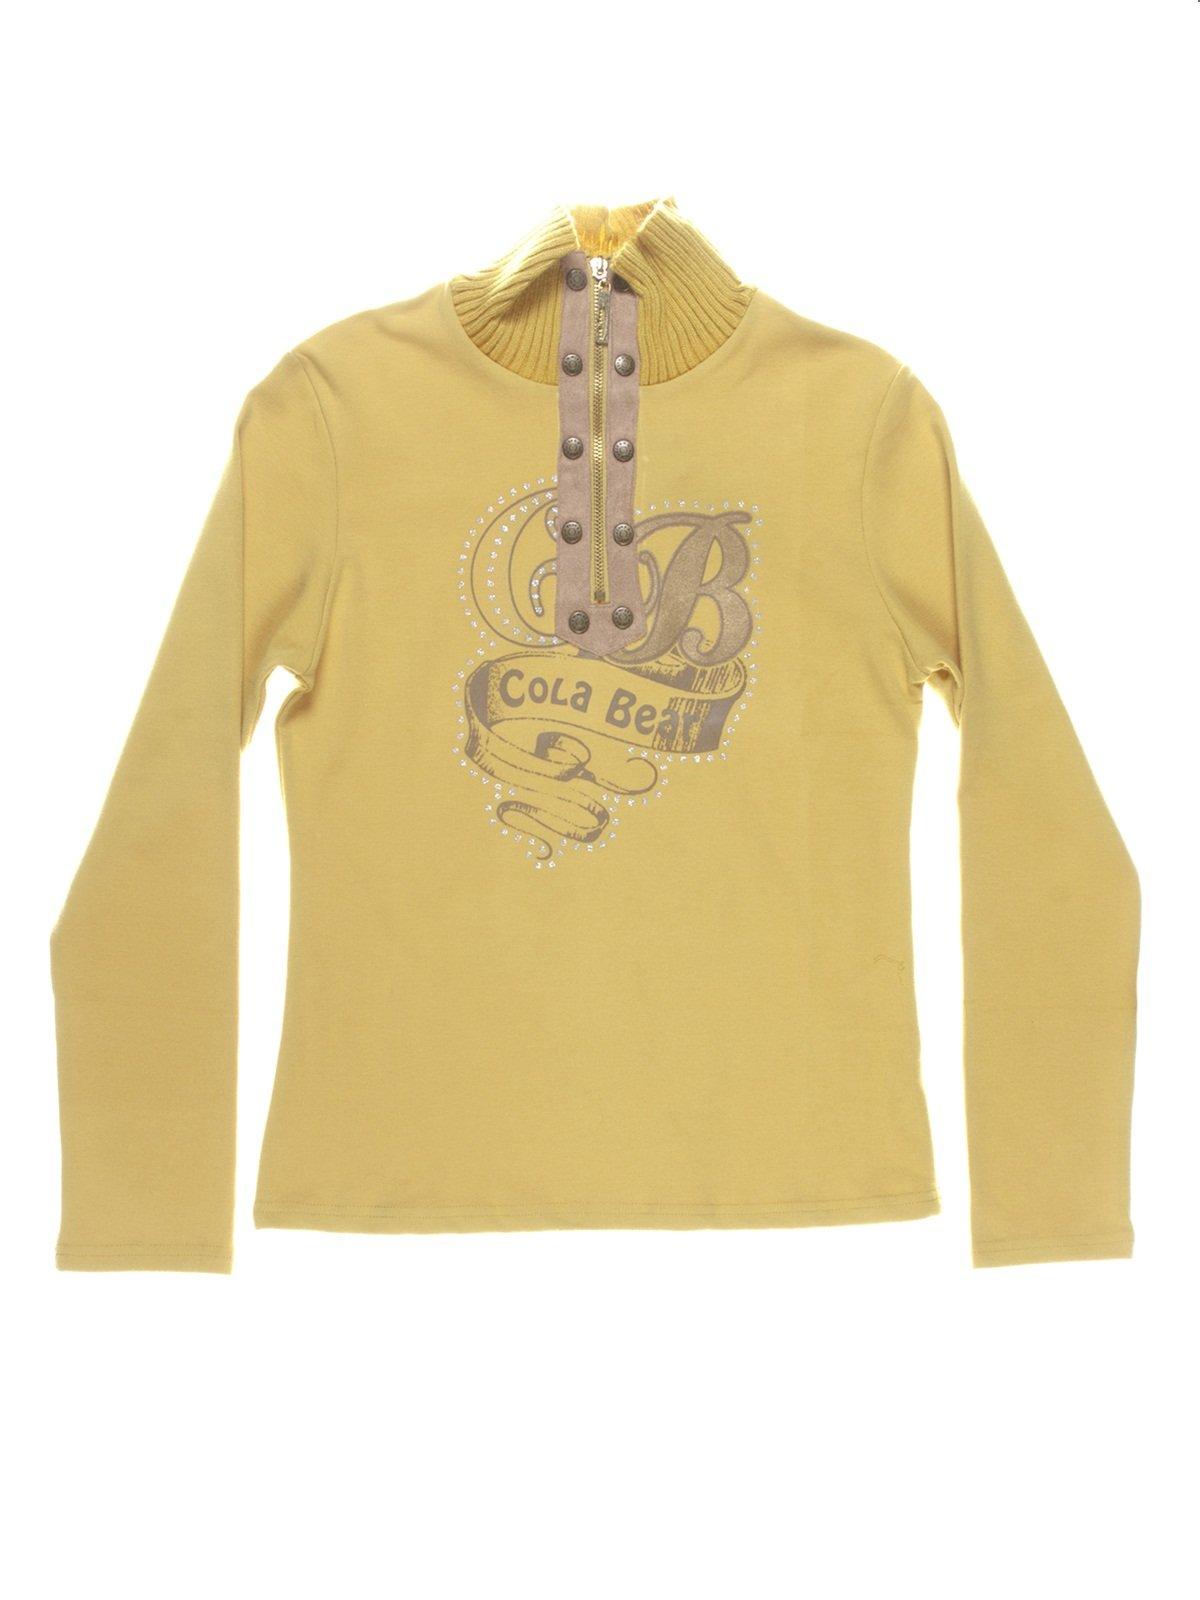 Гольф желто-фисташкового цвета | 712478